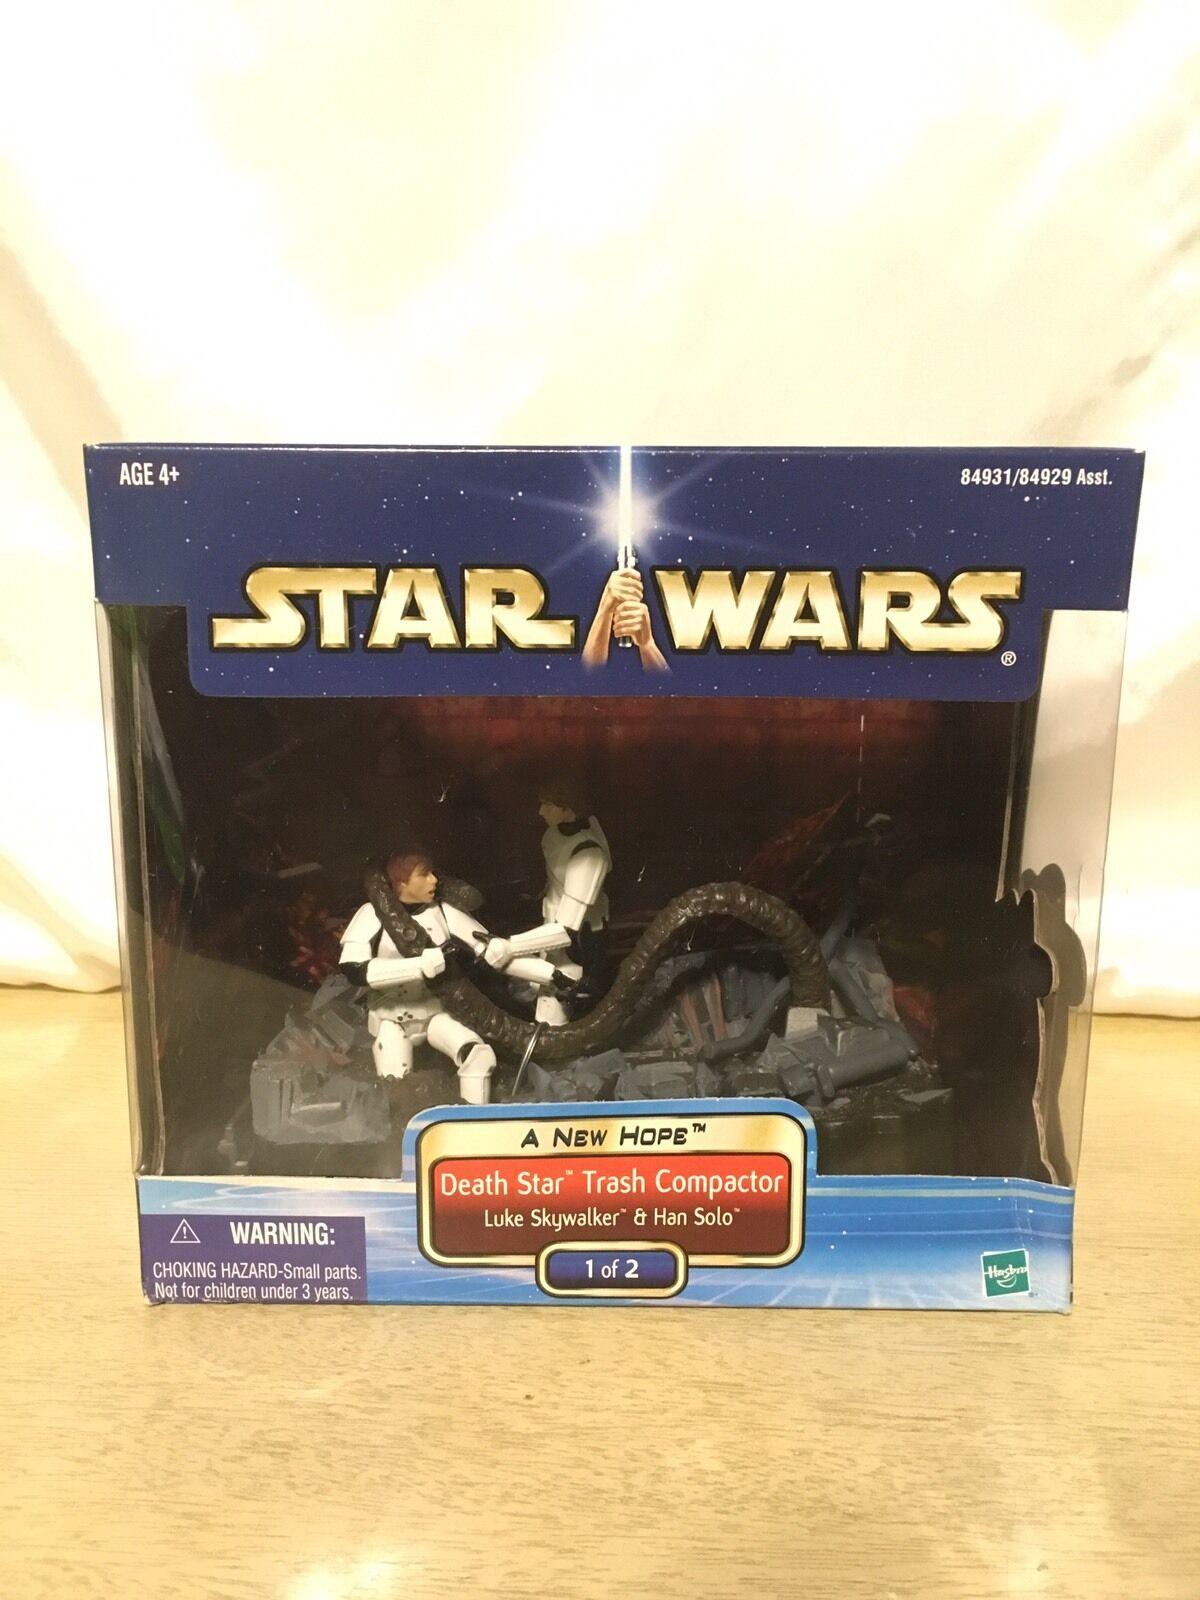 Star Wars A New Hope Death Star Trash Compactor 1/2 Han & Luke New Sealed